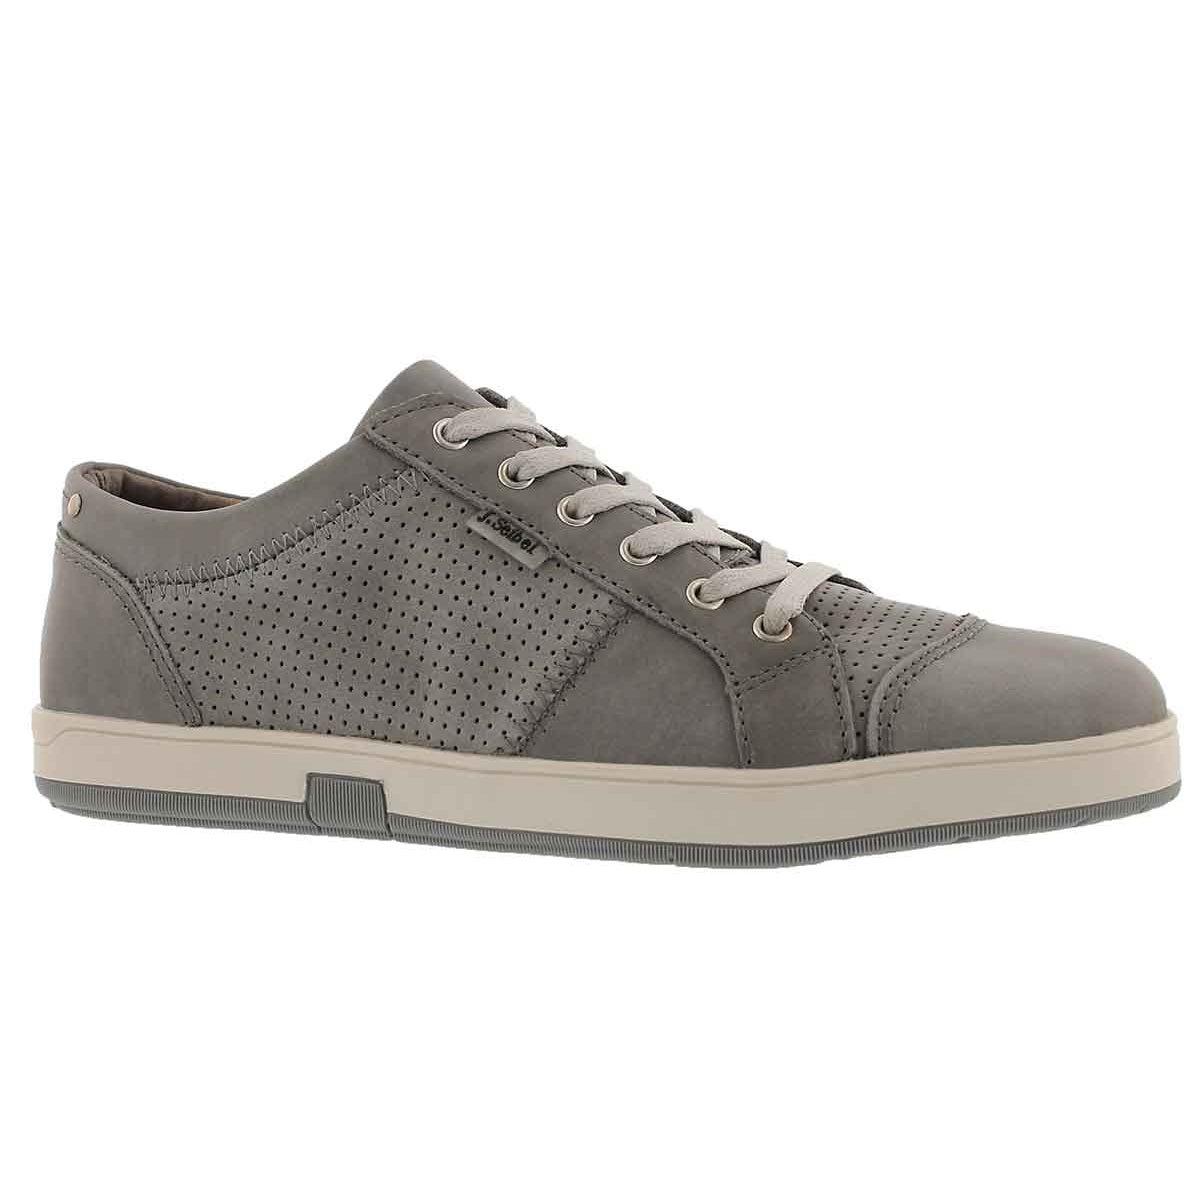 Men's GATTEO 01 asphalt leather lace up sneakers